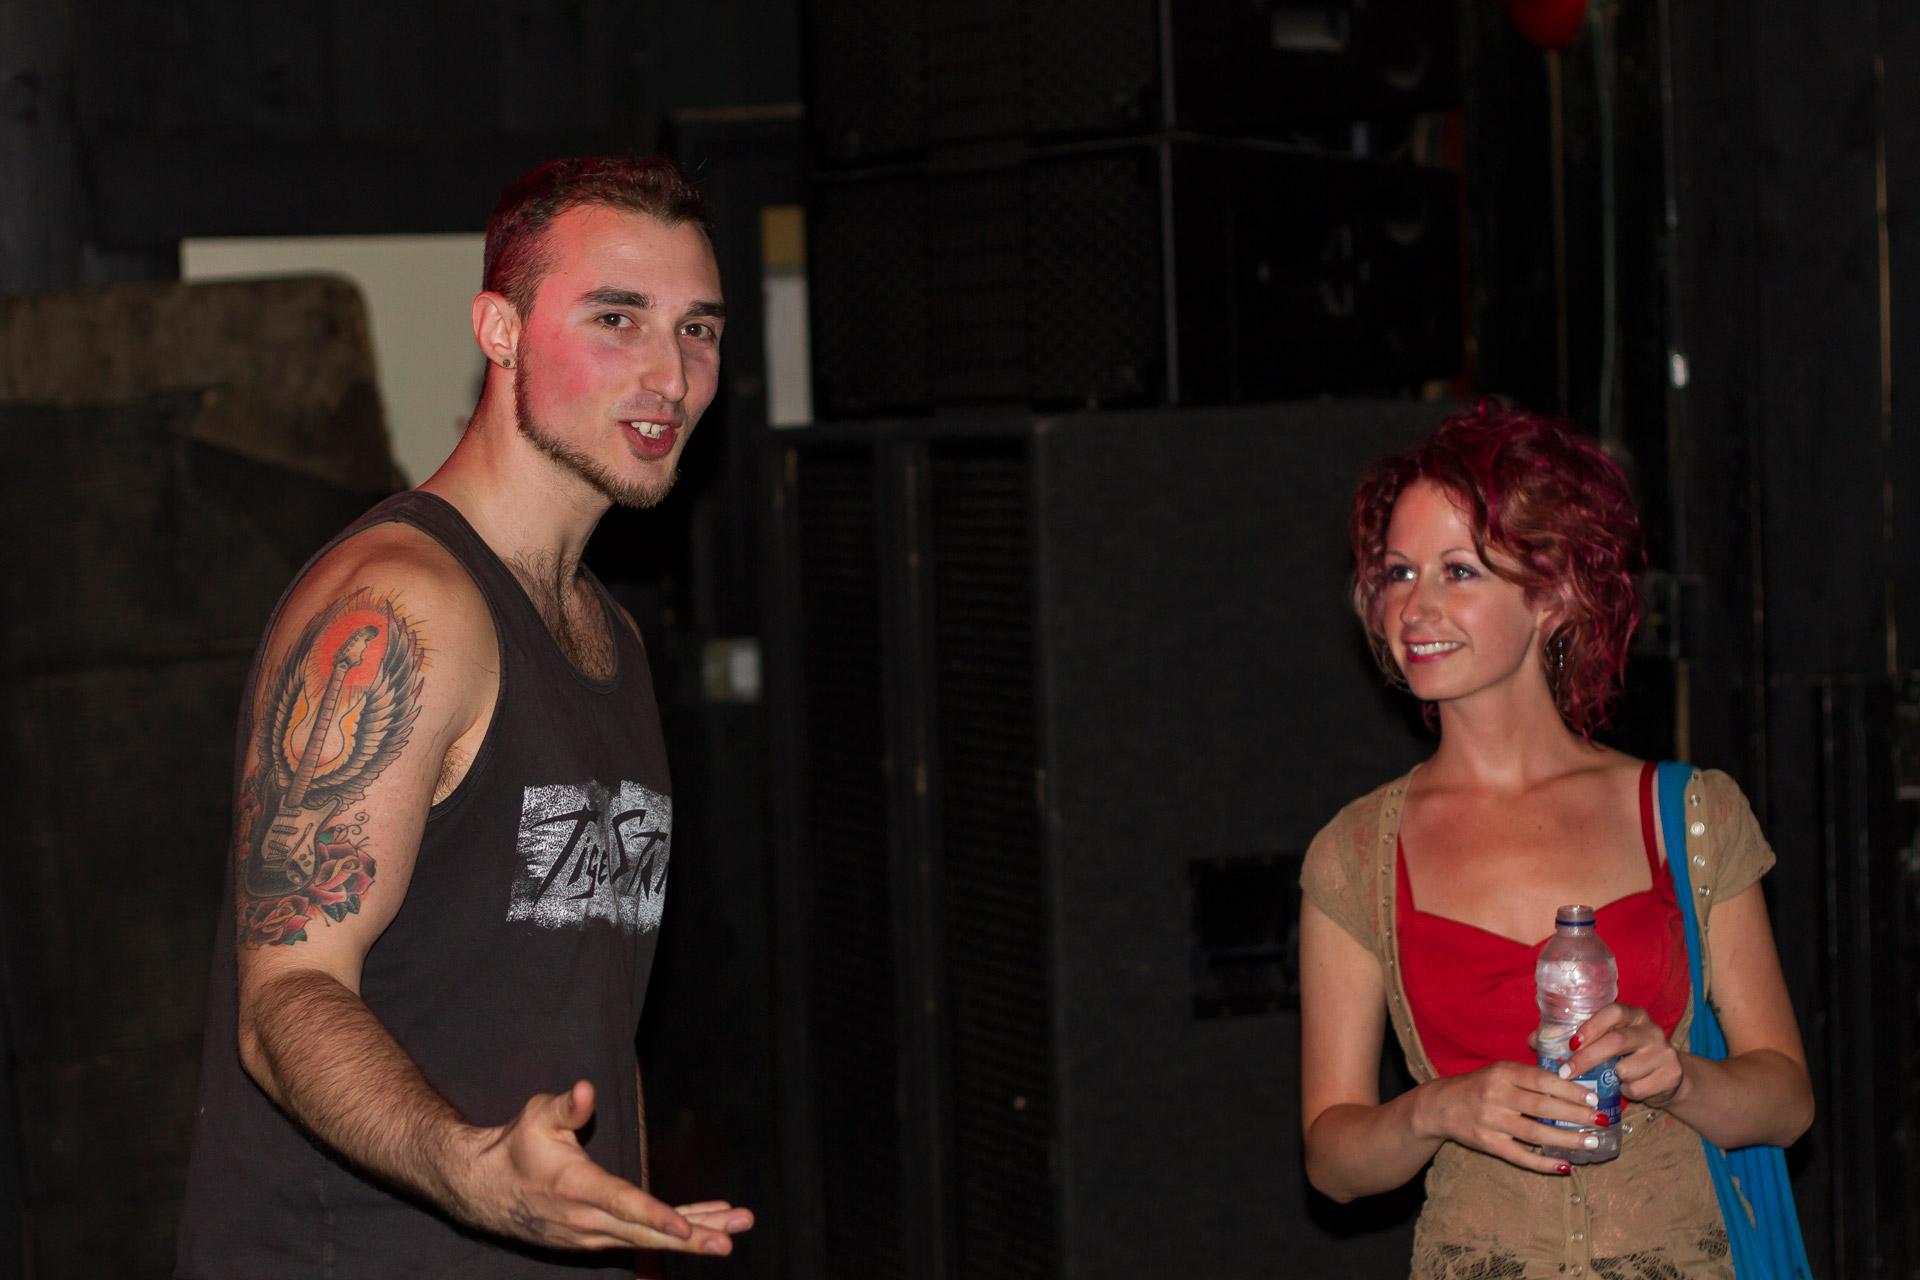 Andrew Moniz and Kez of Jackstay